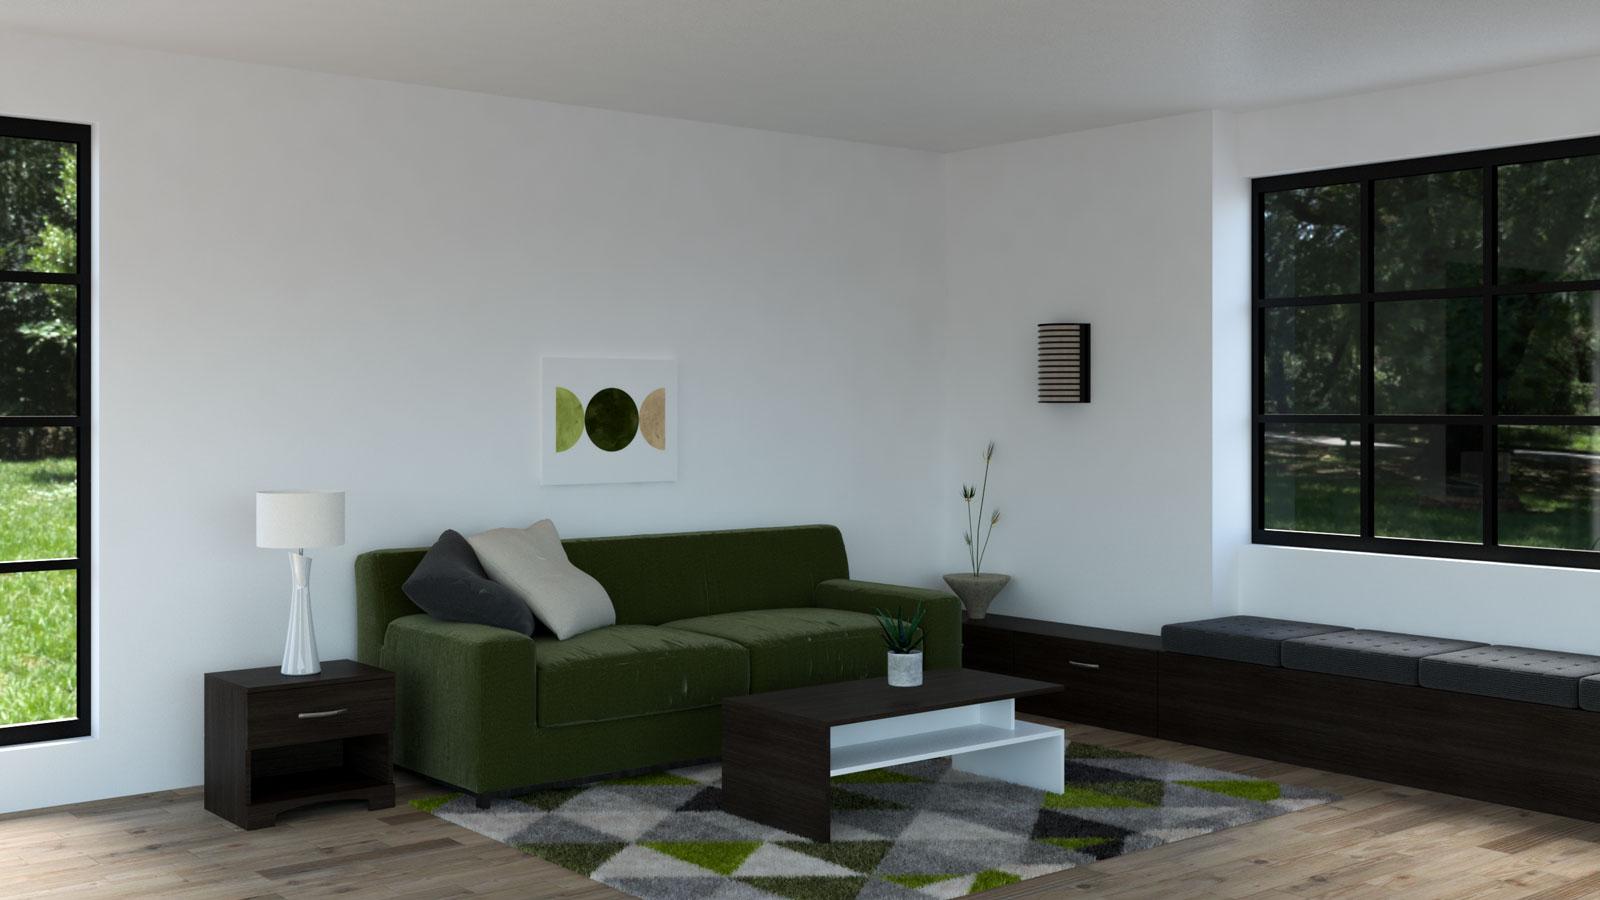 Dark olive couch with espresso furniture